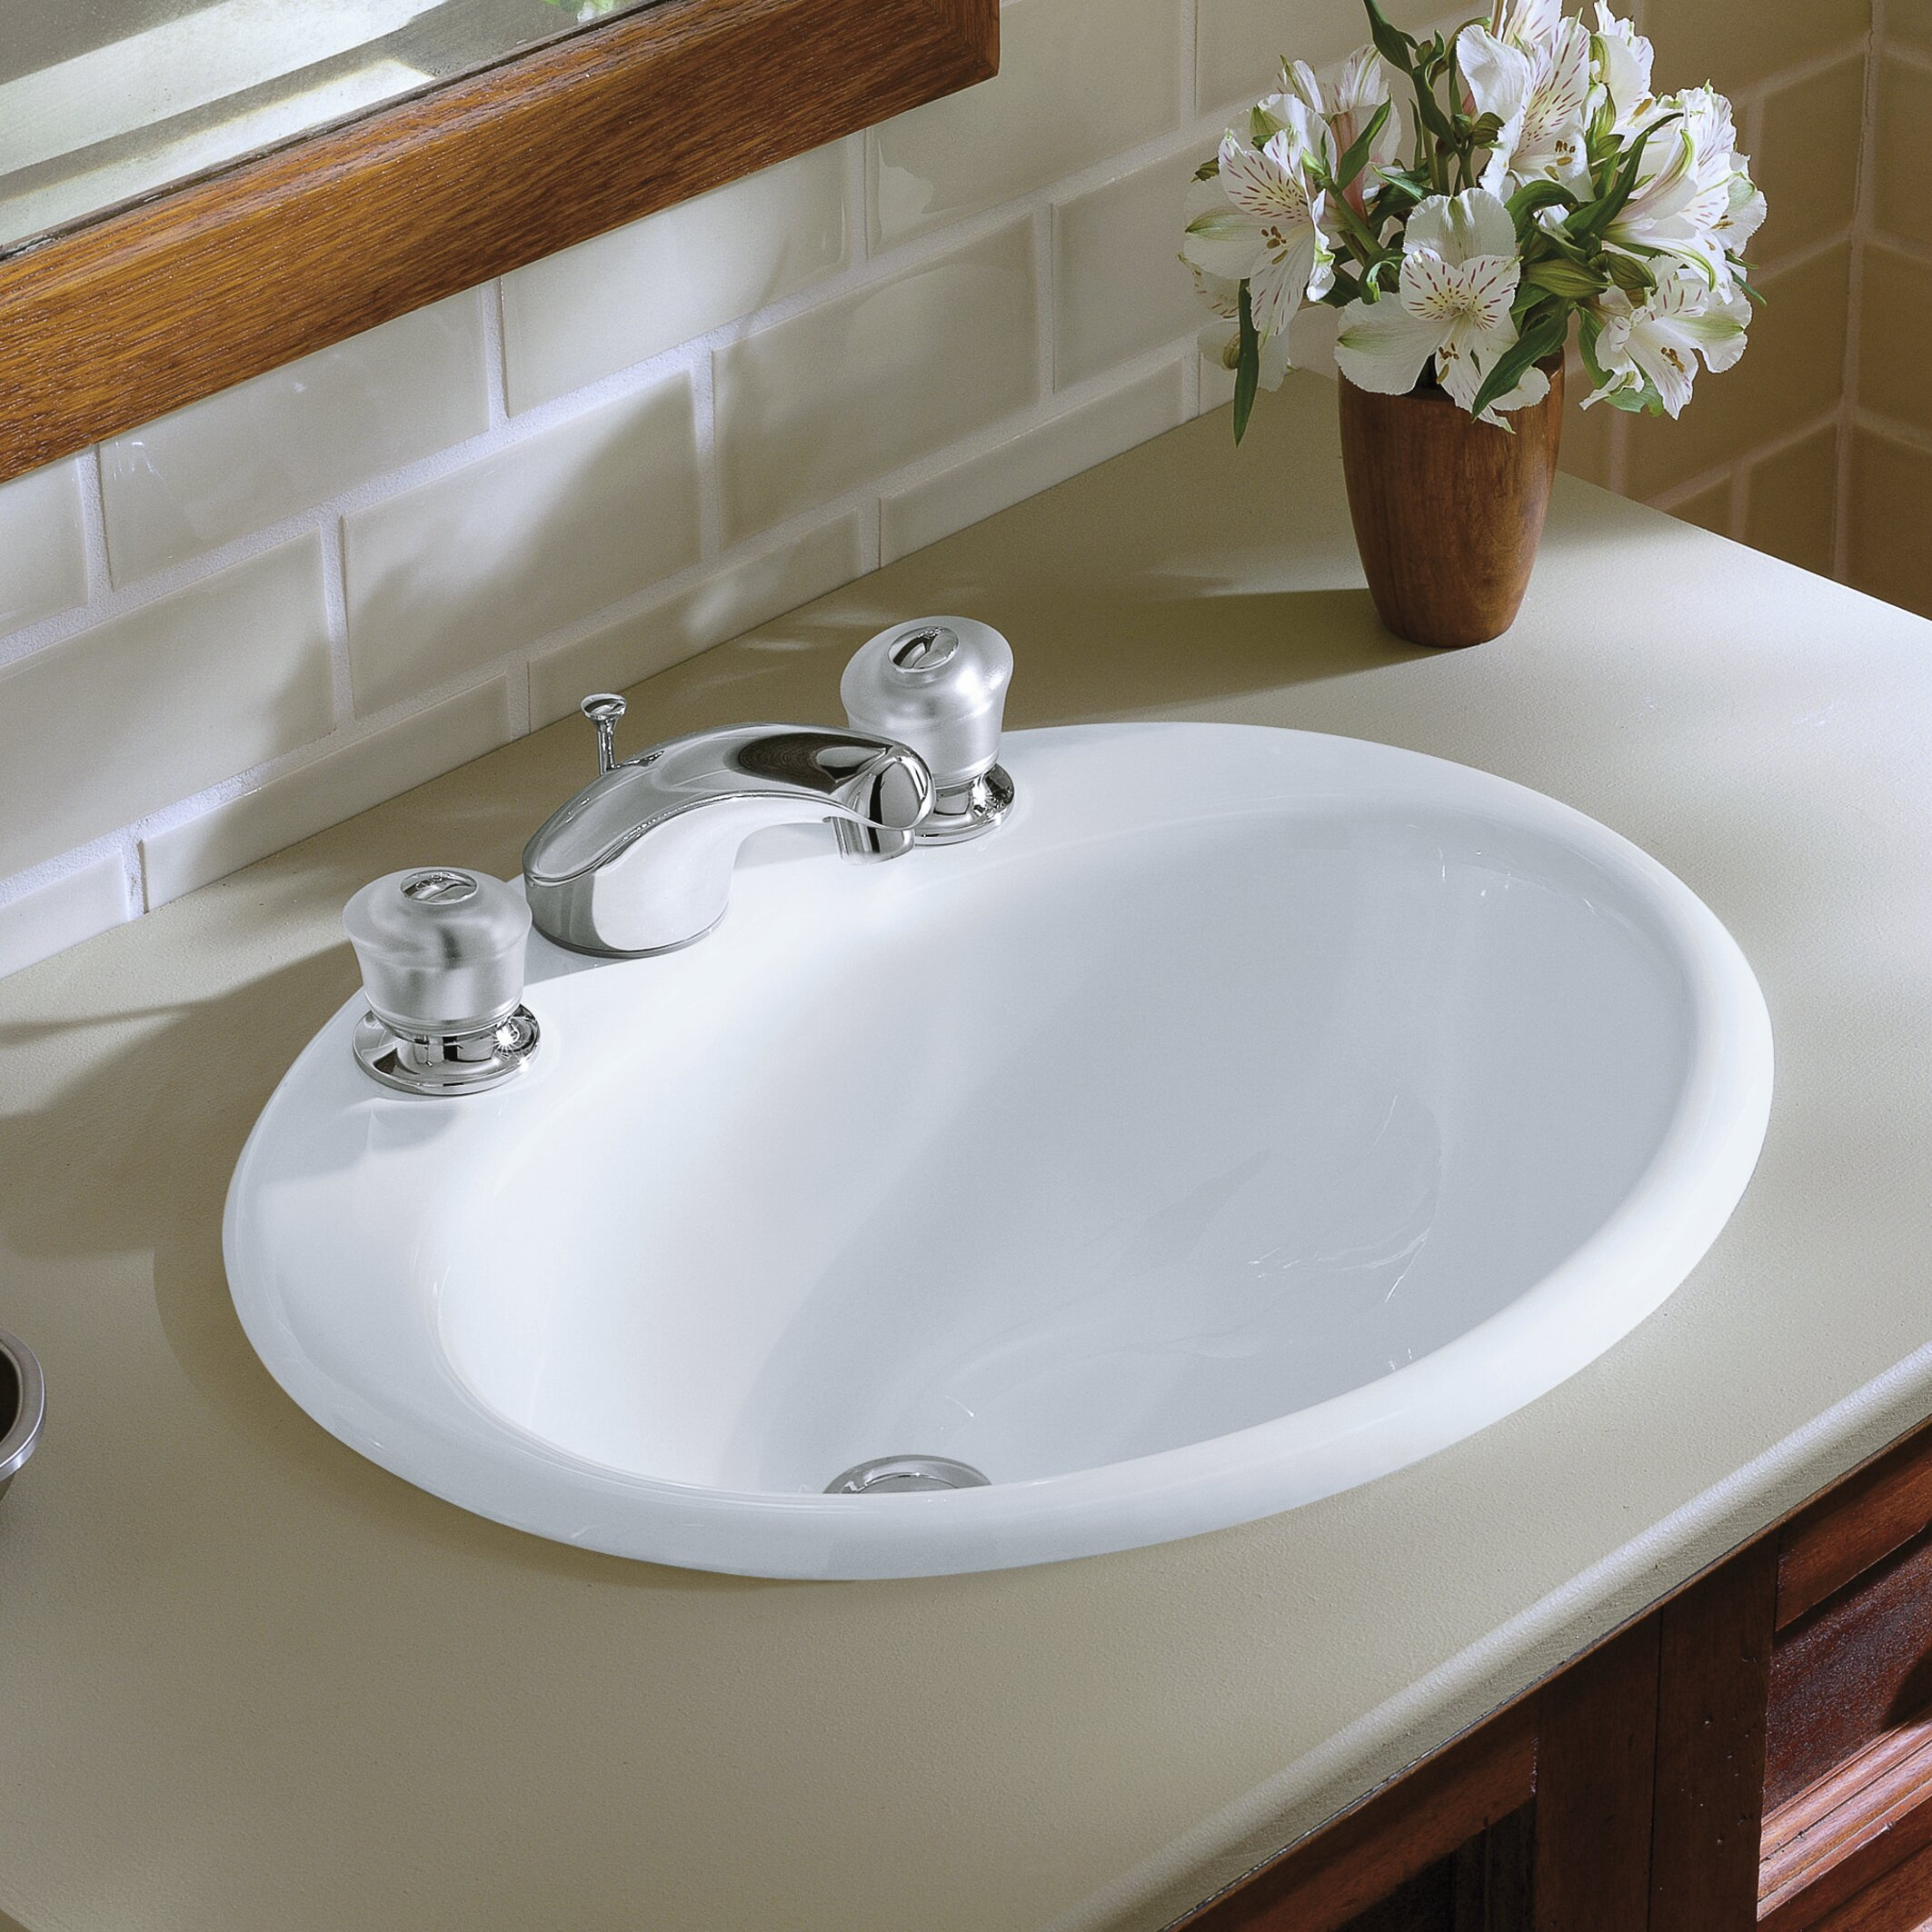 Bathroom Sink Faucet Types - Home Design - Game-hay.us